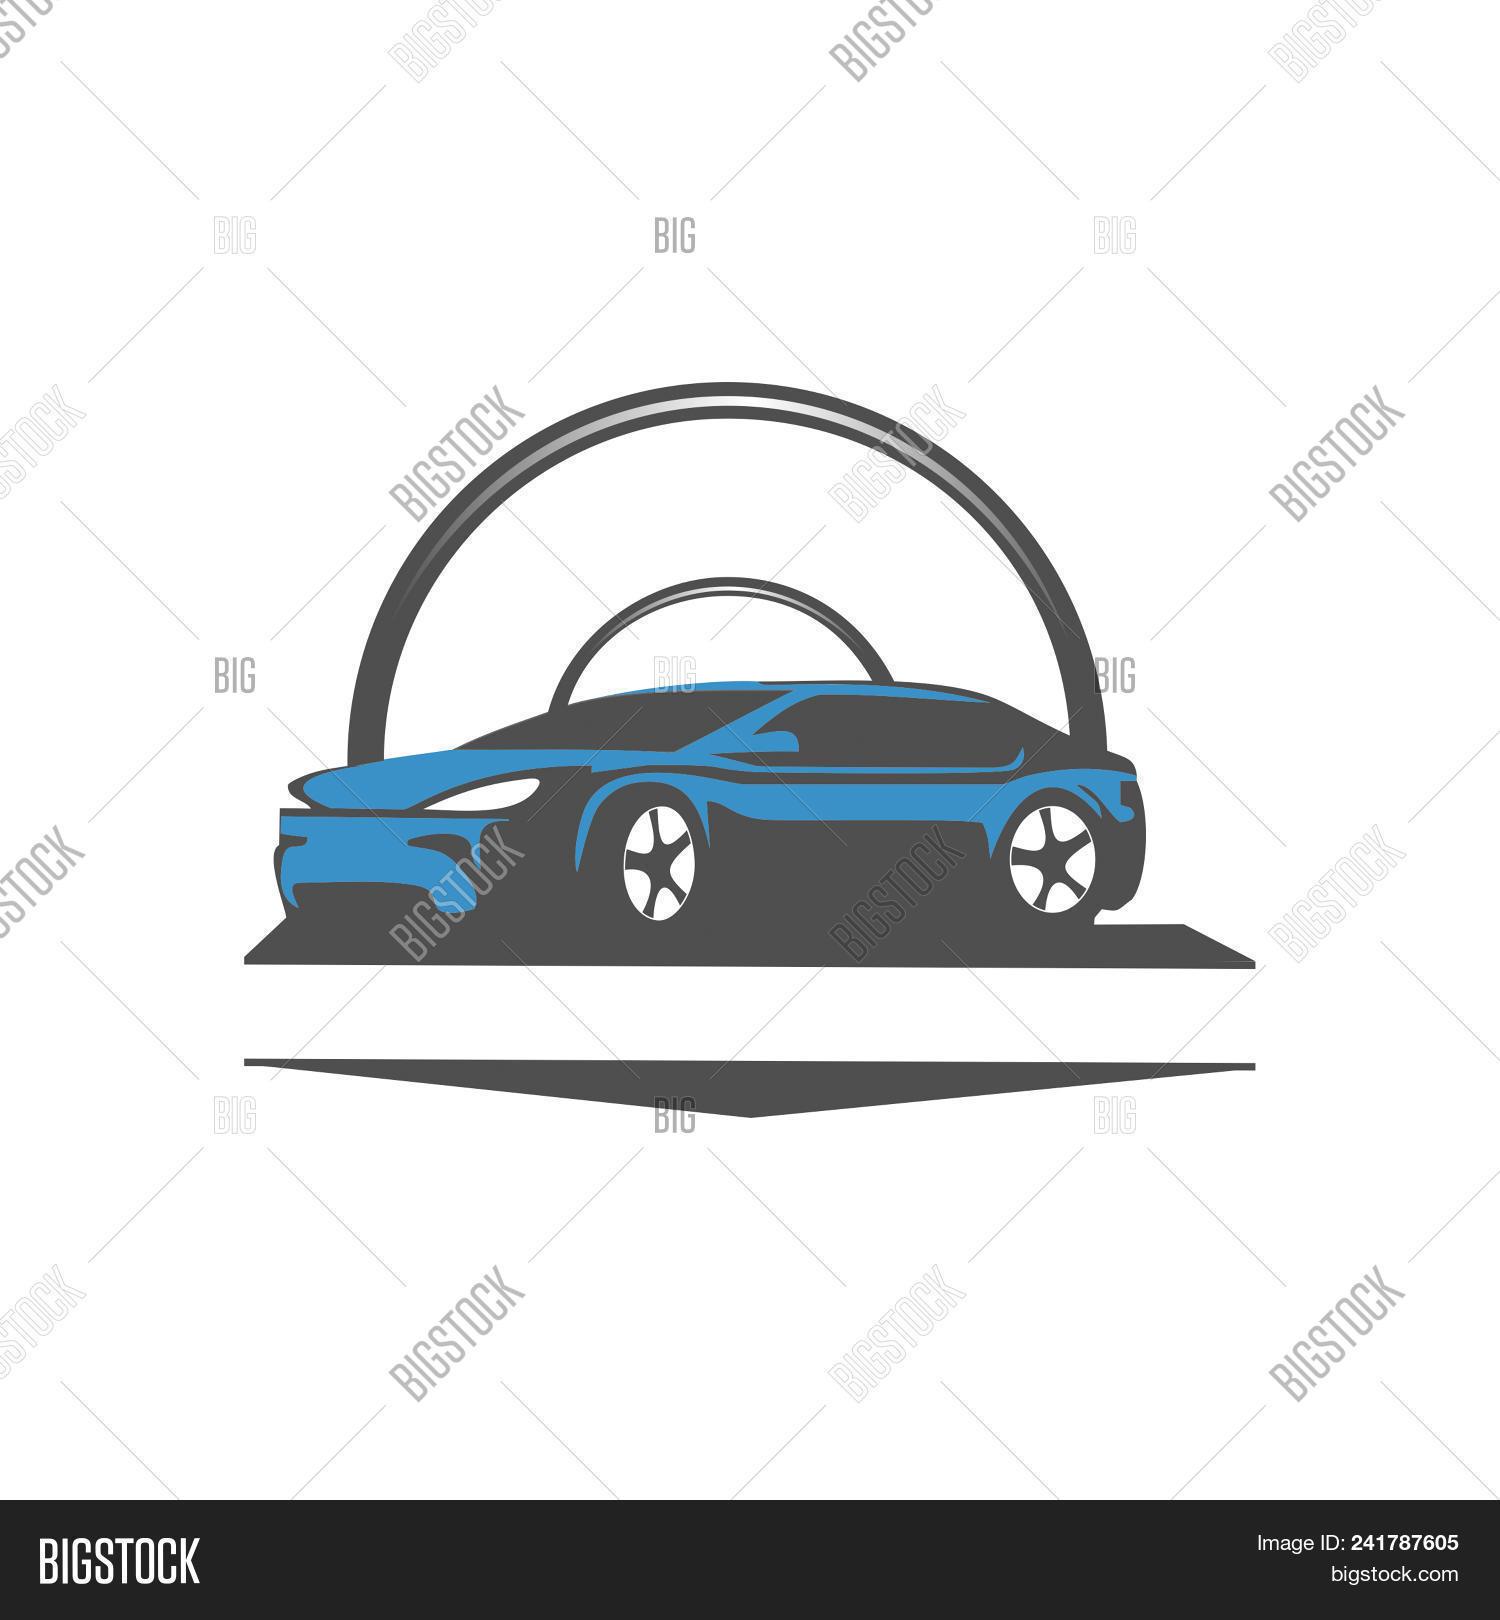 Logo Car Services, Image & Photo (Free Trial) | Bigstock